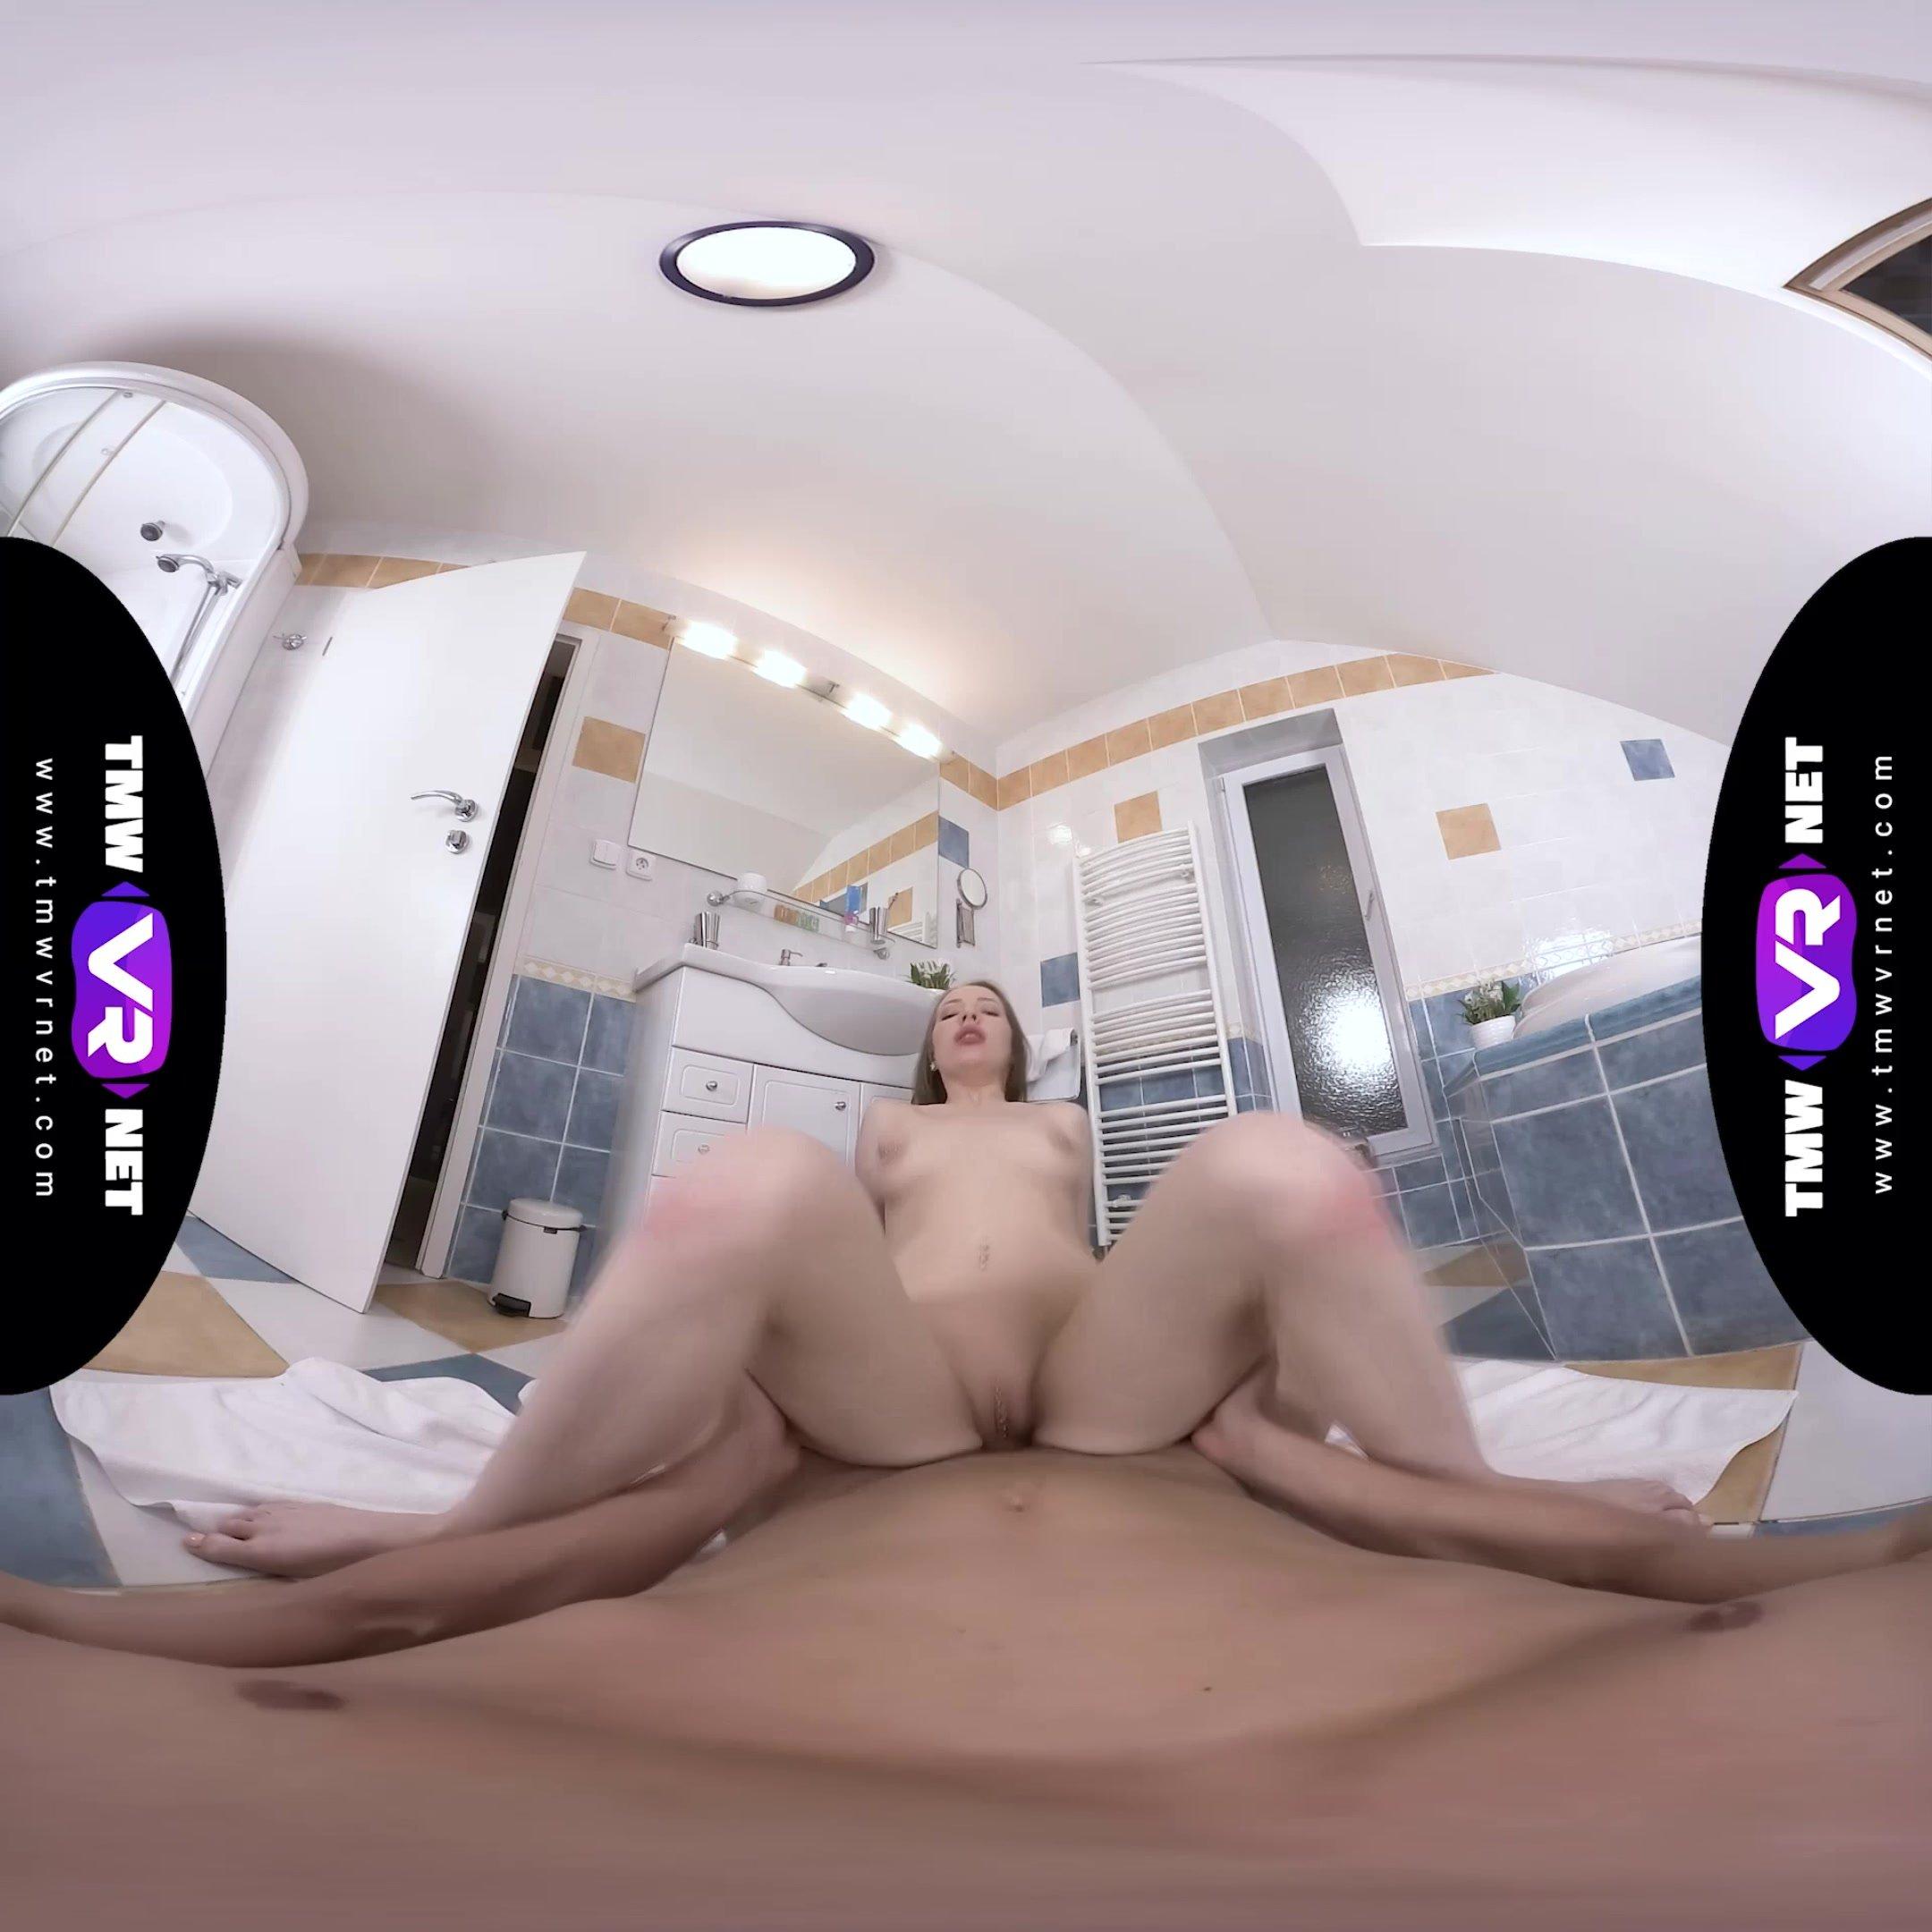 TmwVRnet.com - Linda Weasley - Brushing teeth with sperm